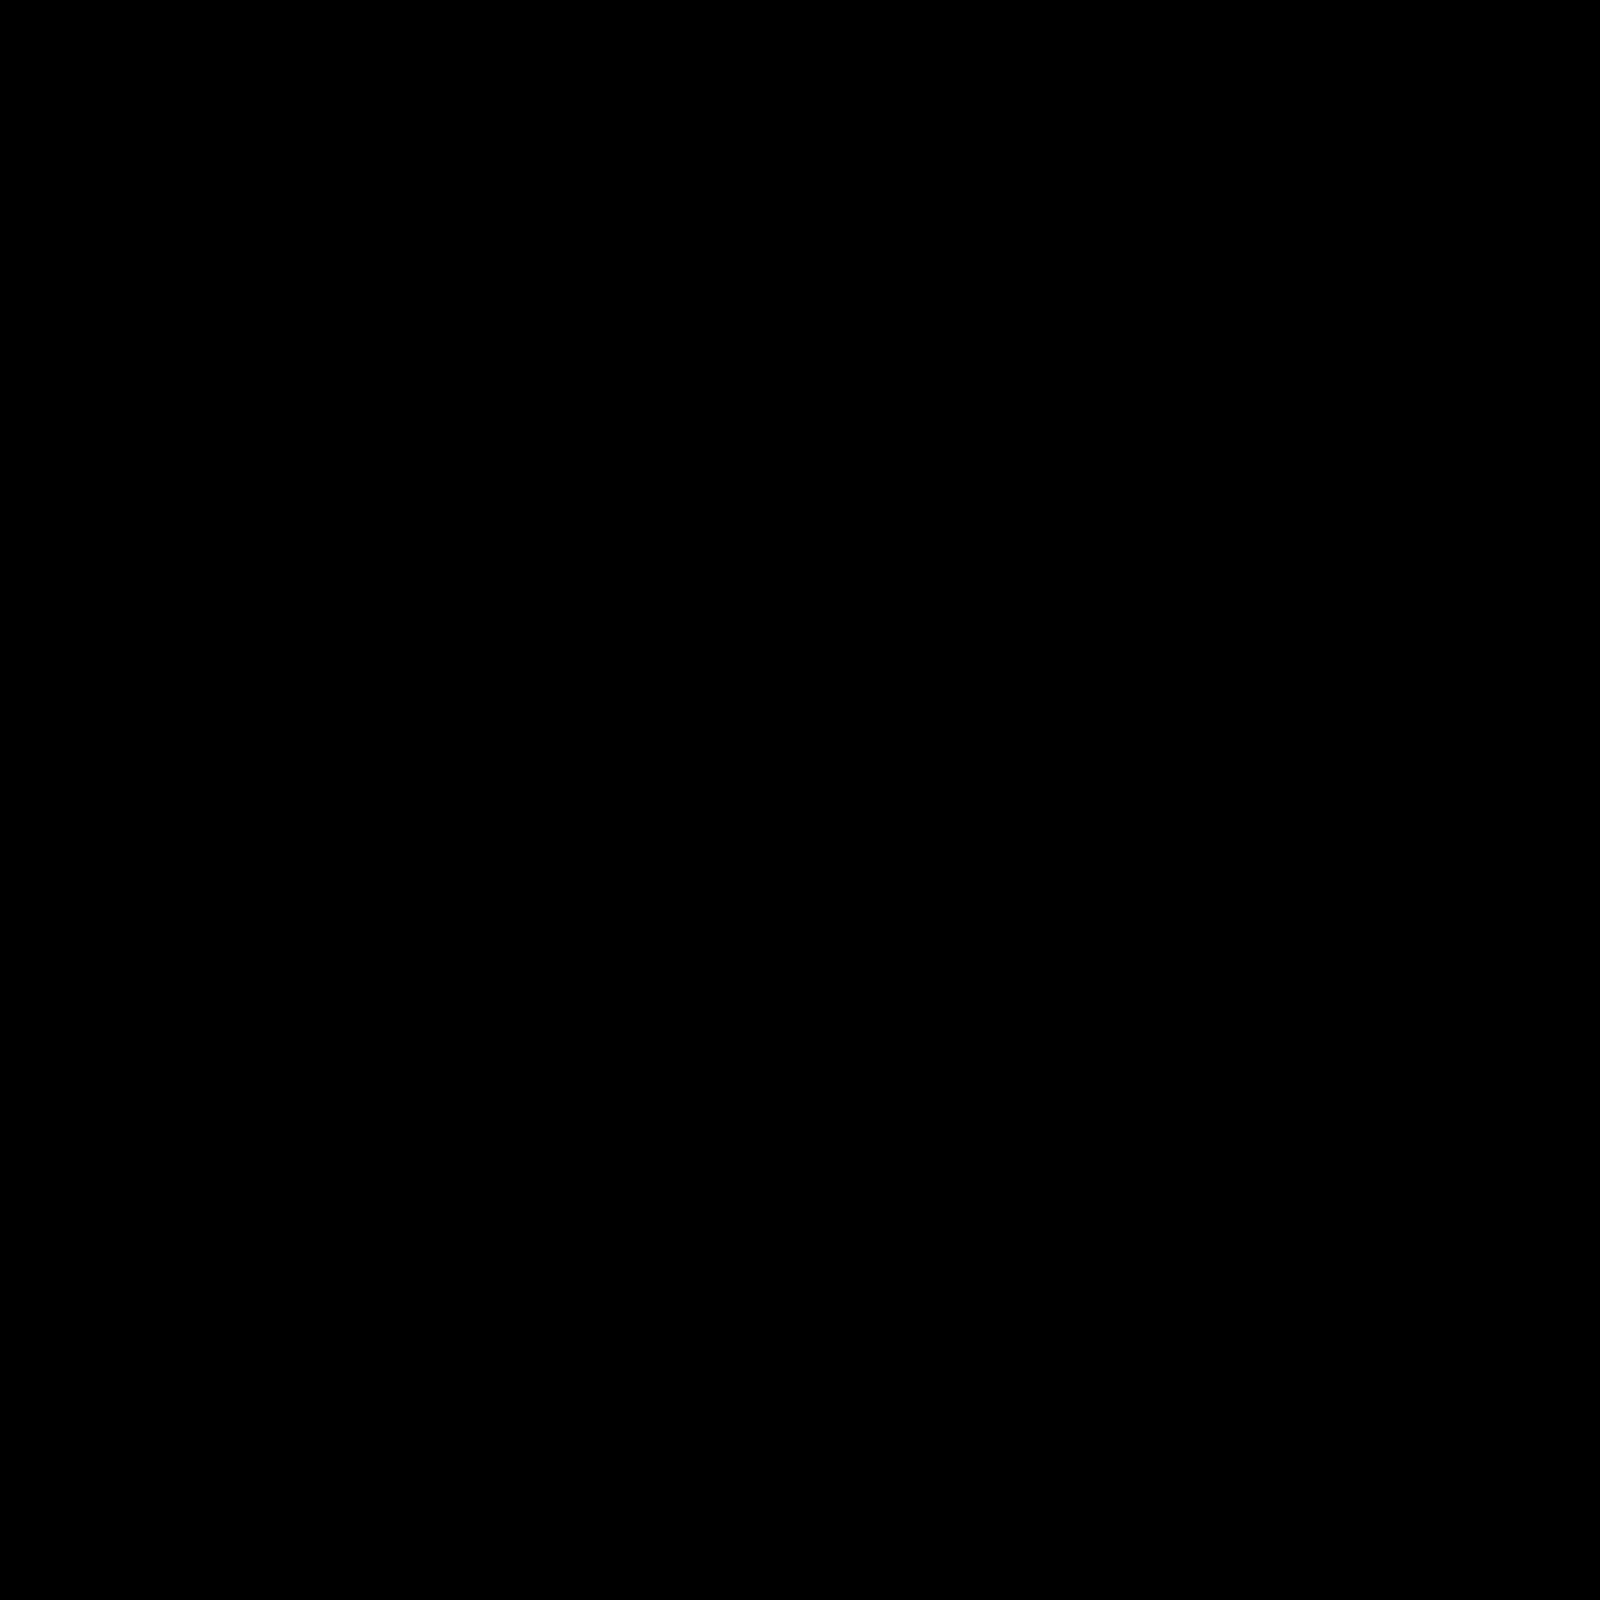 Puszka icon